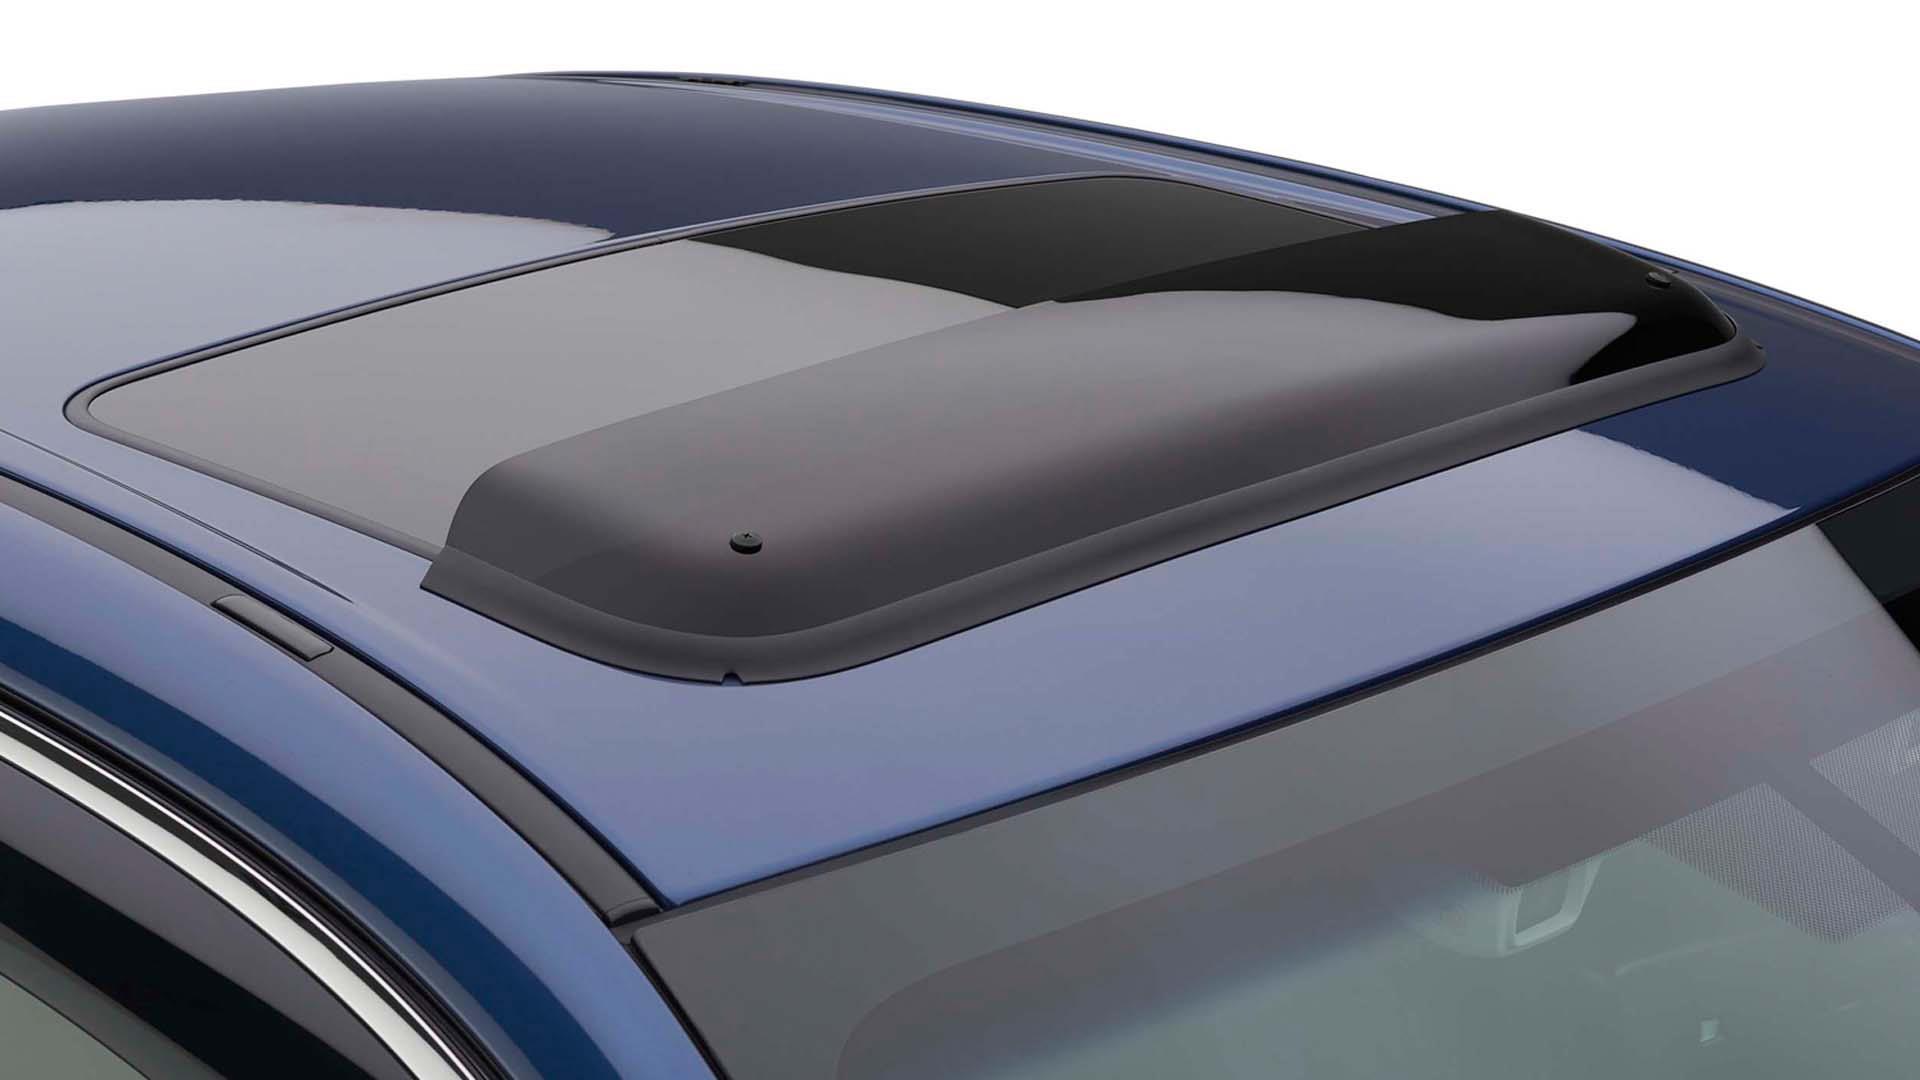 Subaru Outback Moonroof Air Deflector Helps Reduce Wind